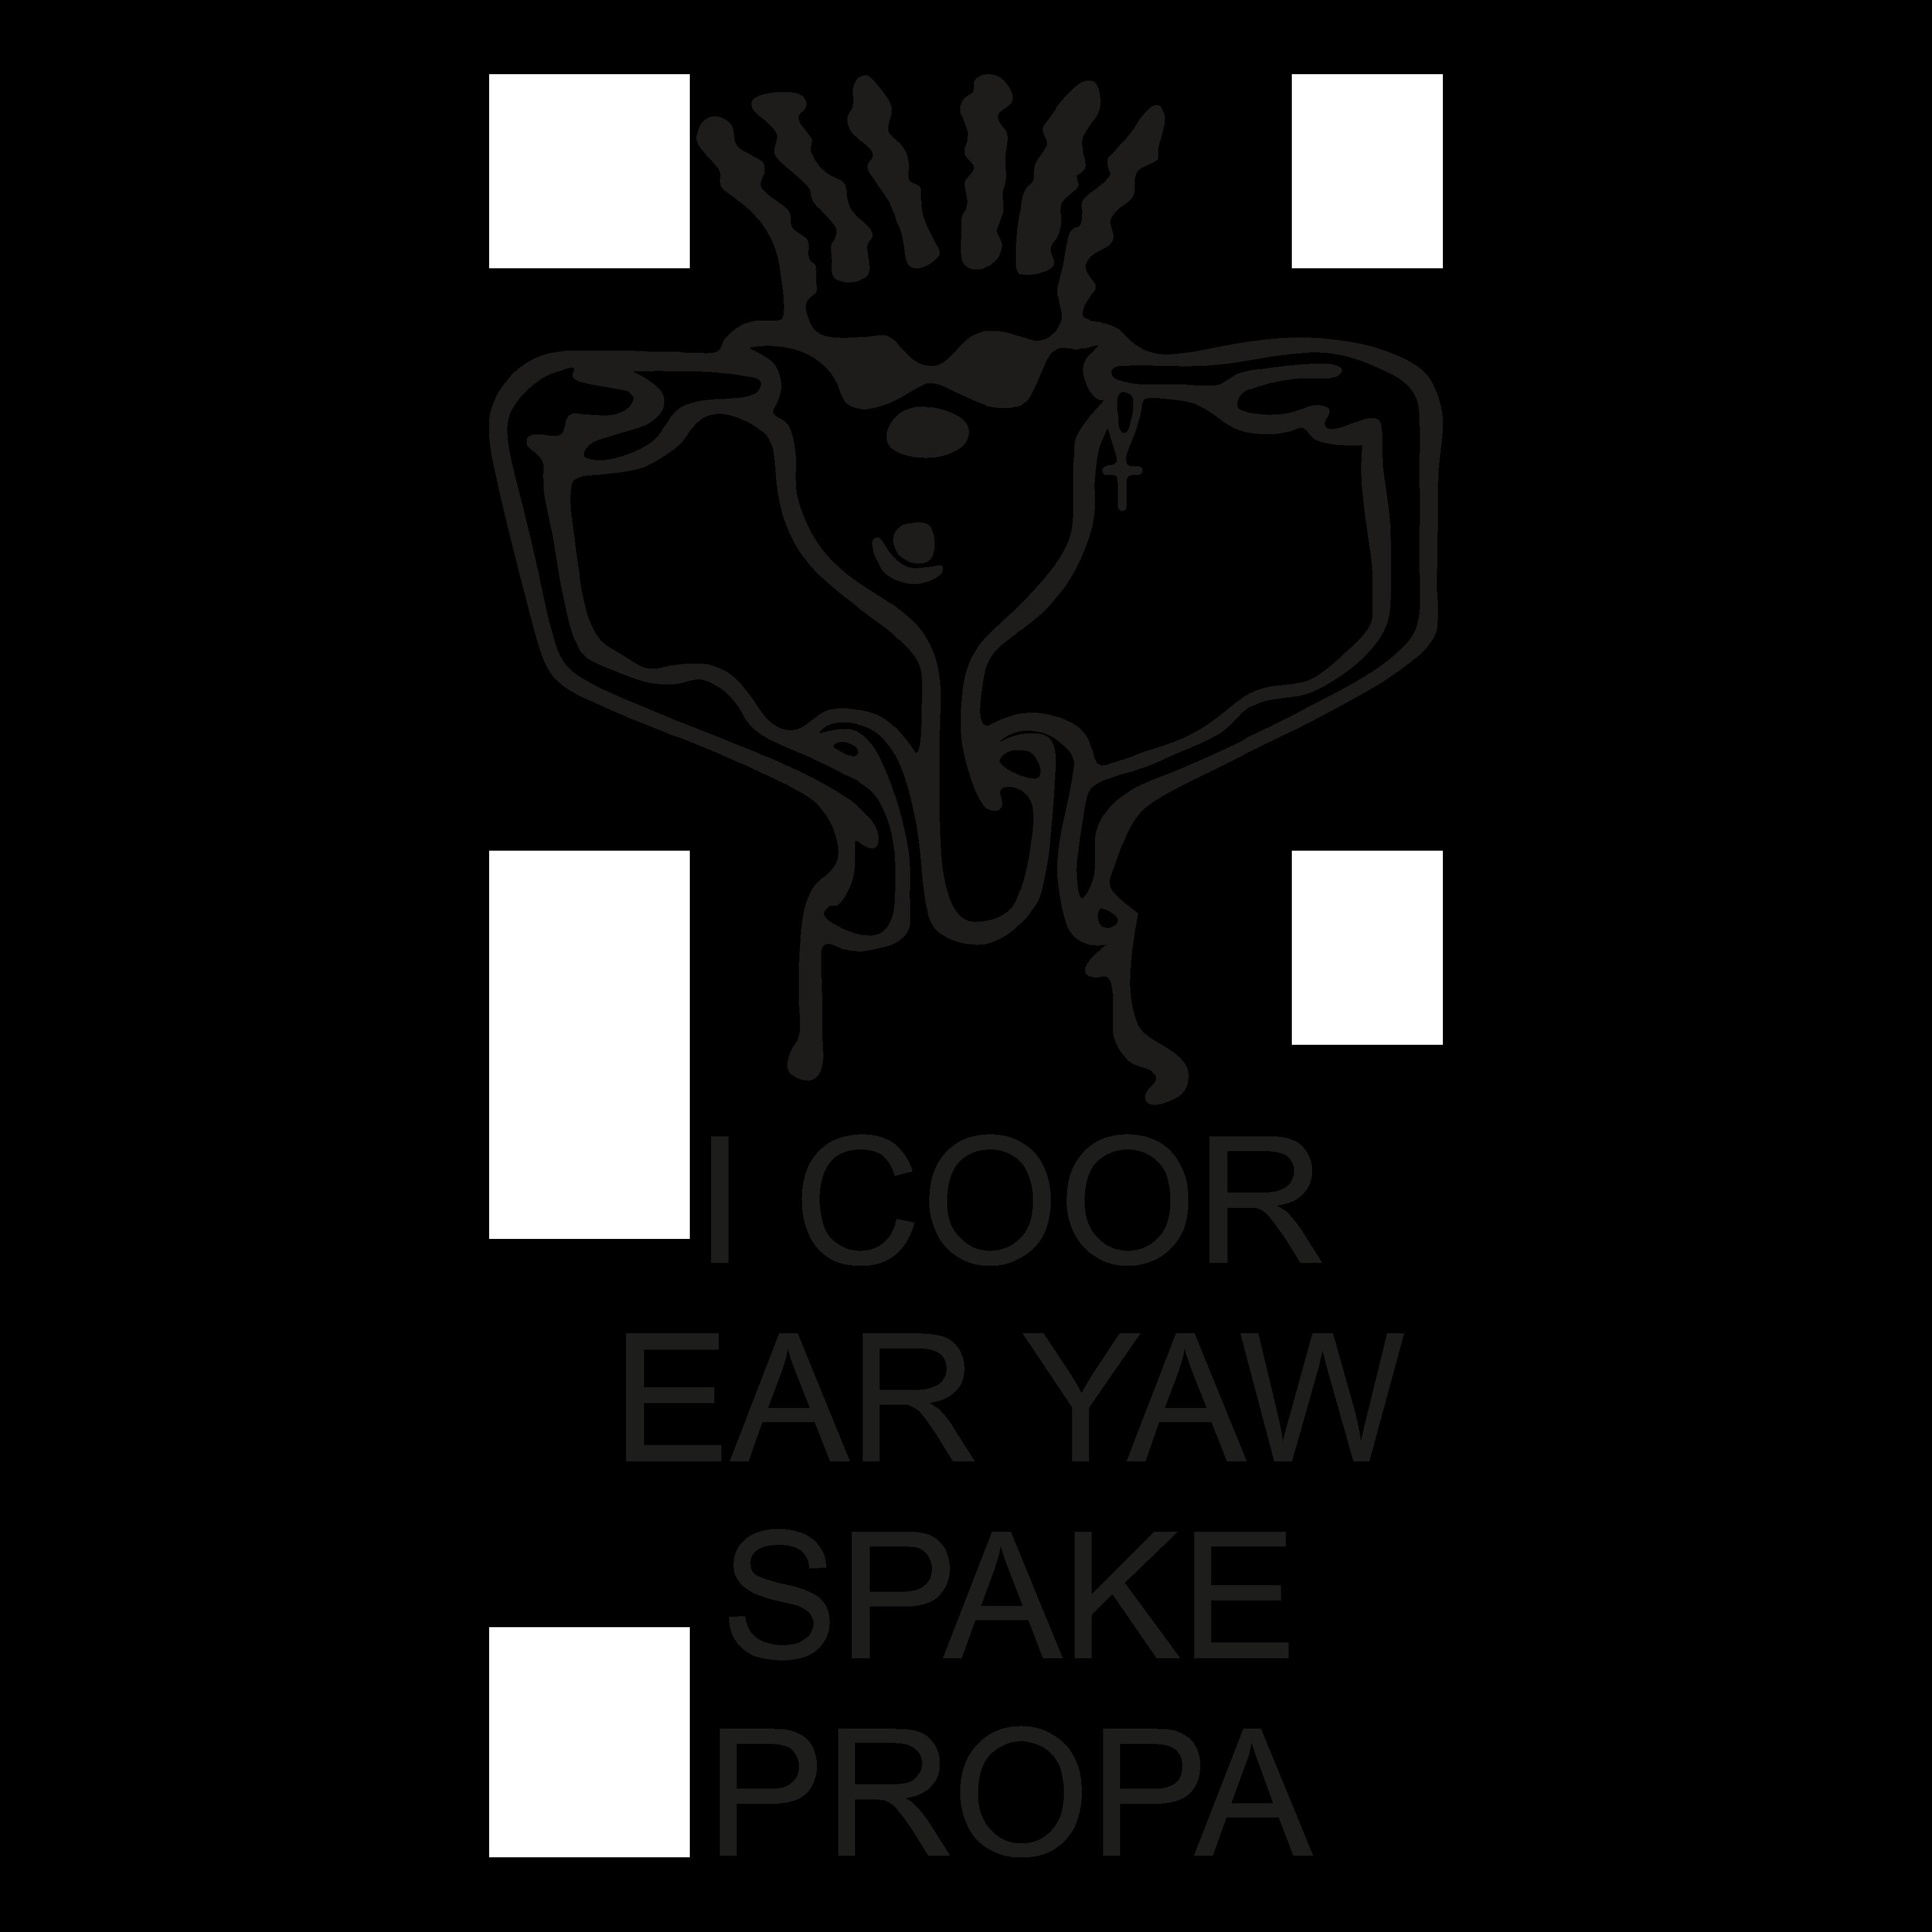 BLC004 - I Coor Ear Yaw Spake Propa